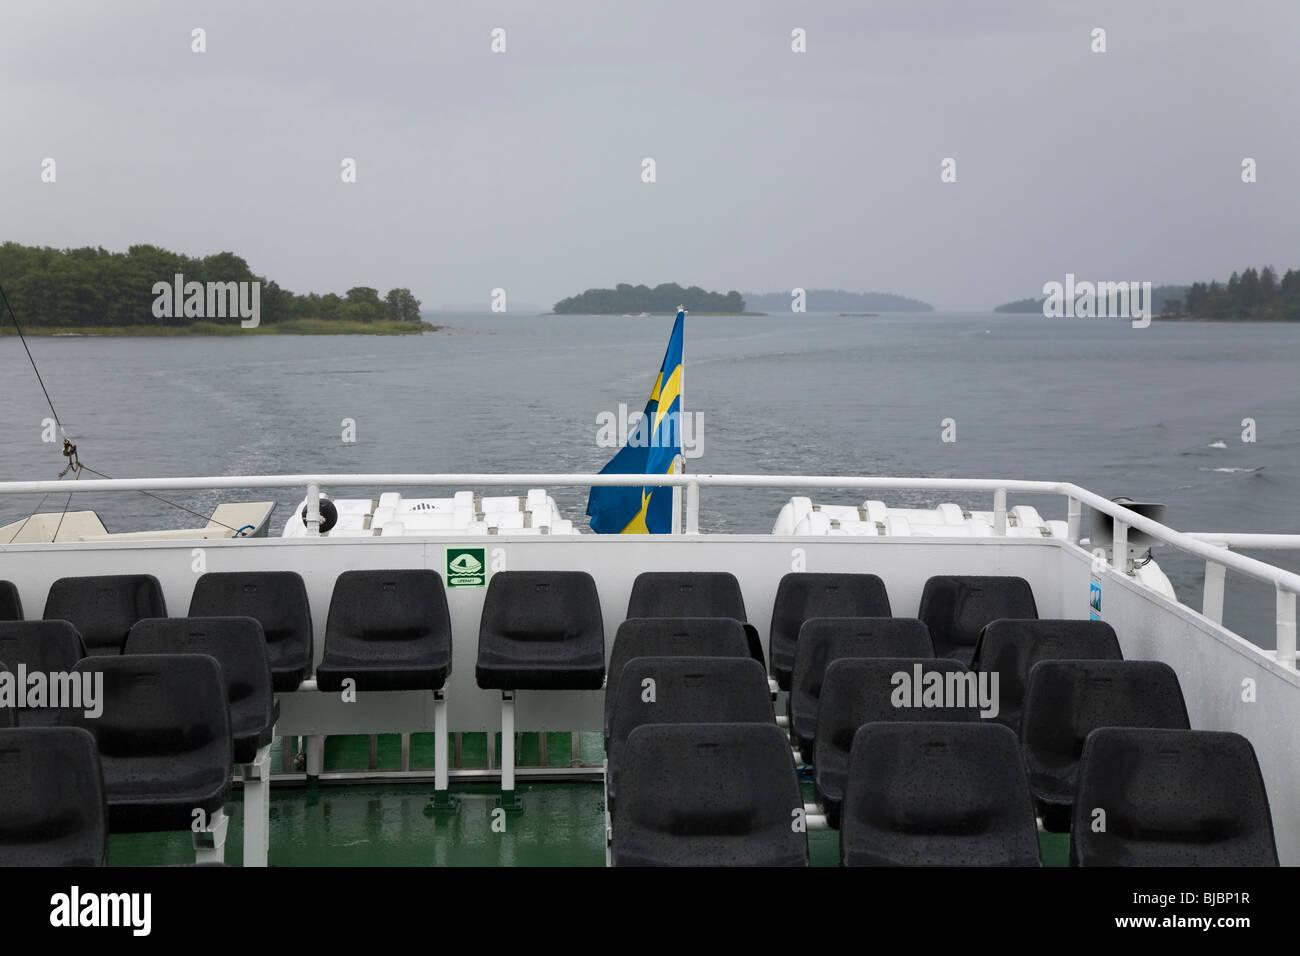 Passenger boat in the 'Archipelago of Stockholm', Sweden. - Stock Image